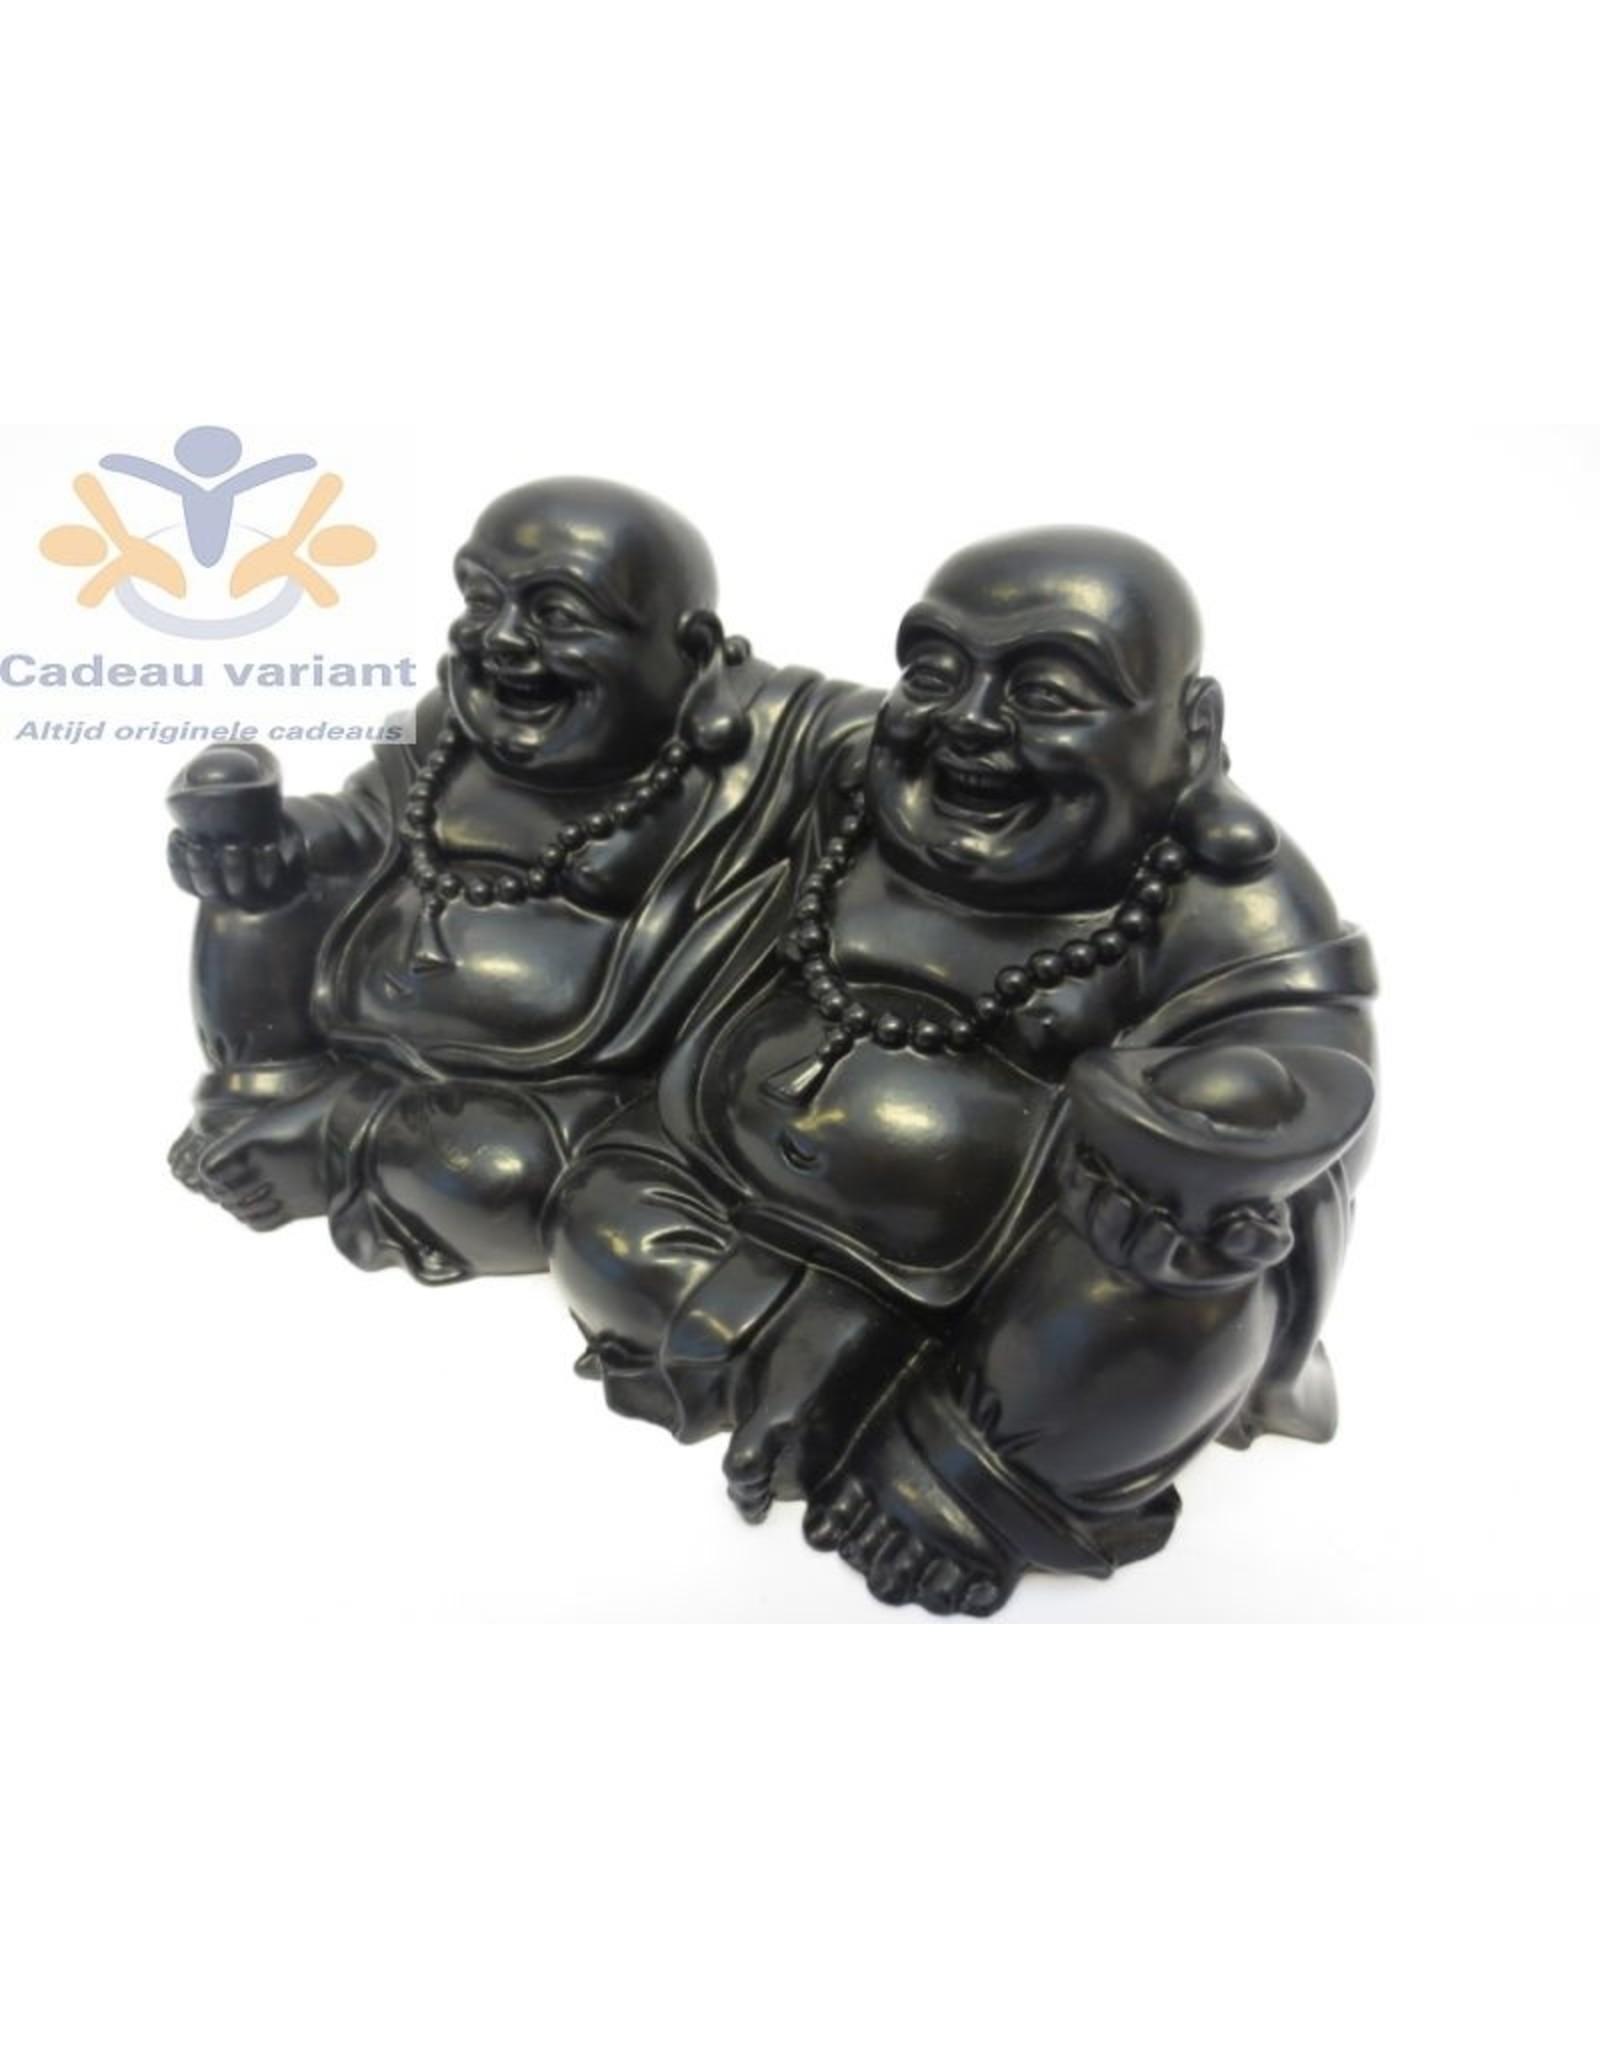 Boeddha vriendschap beeld